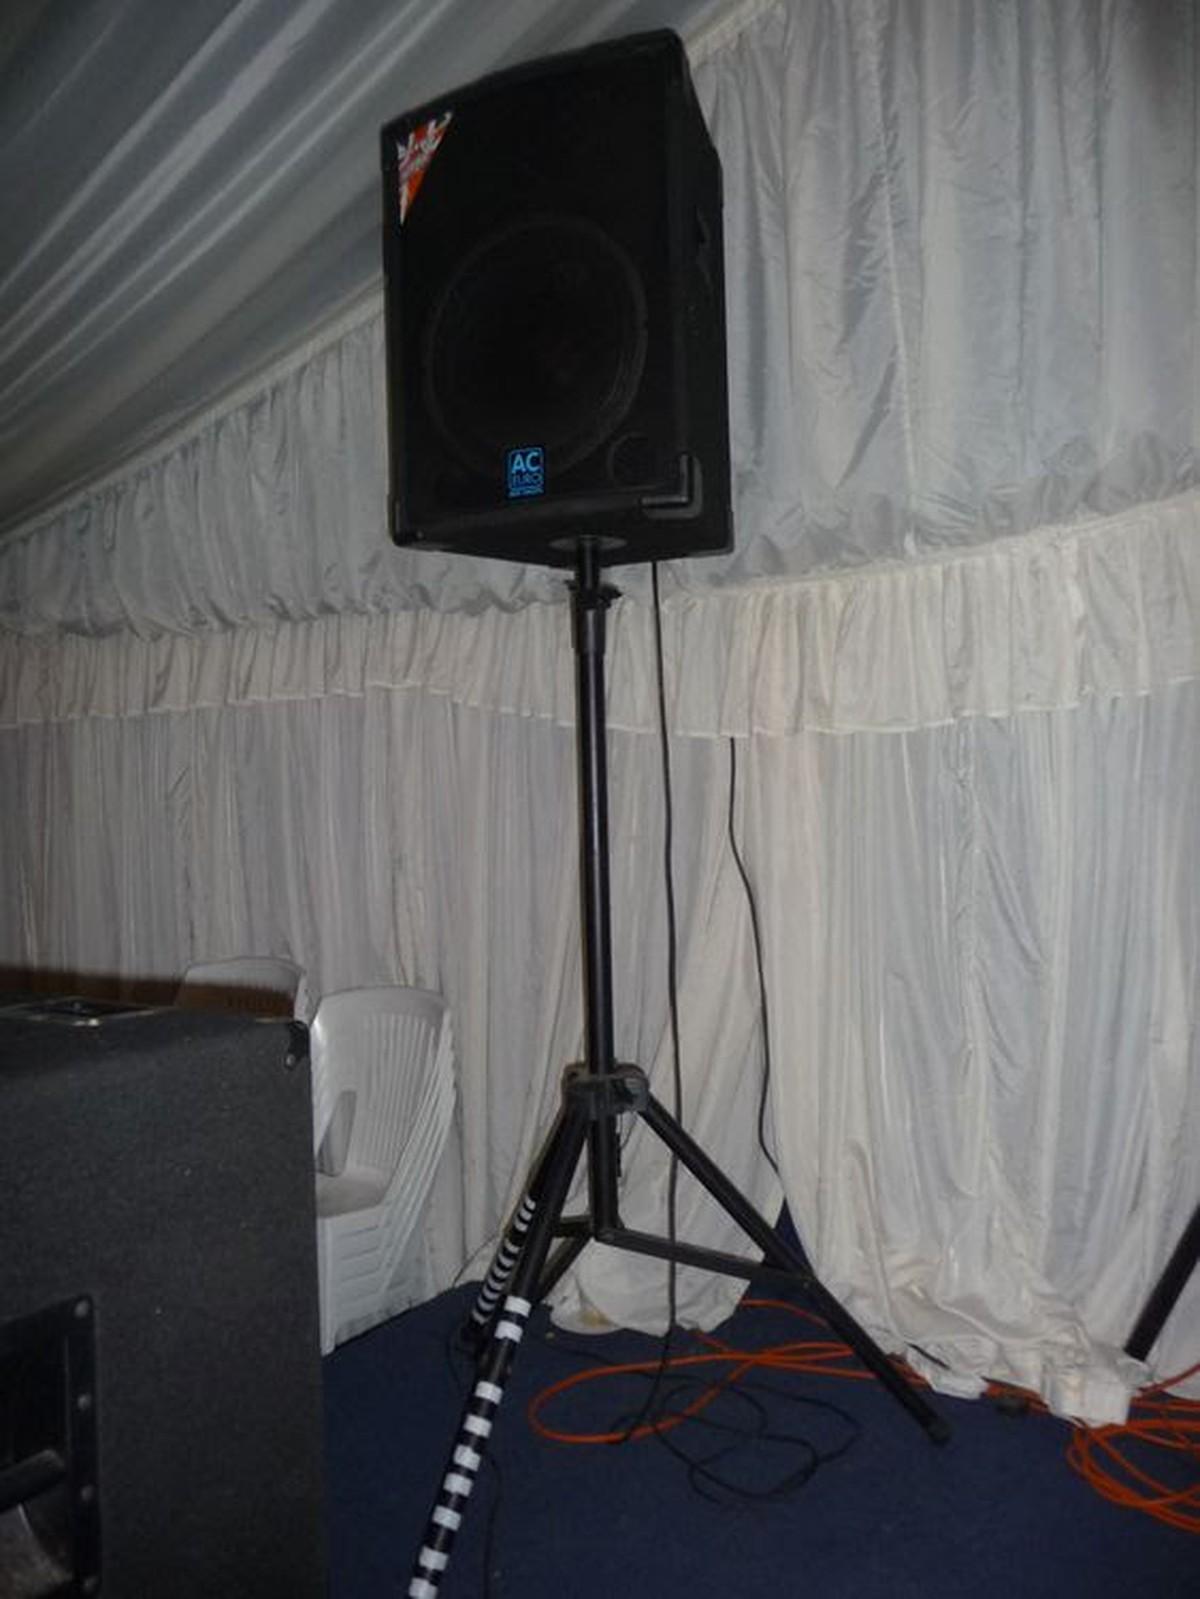 secondhand sound and lighting equipment dj equipment full disco set of equipment. Black Bedroom Furniture Sets. Home Design Ideas